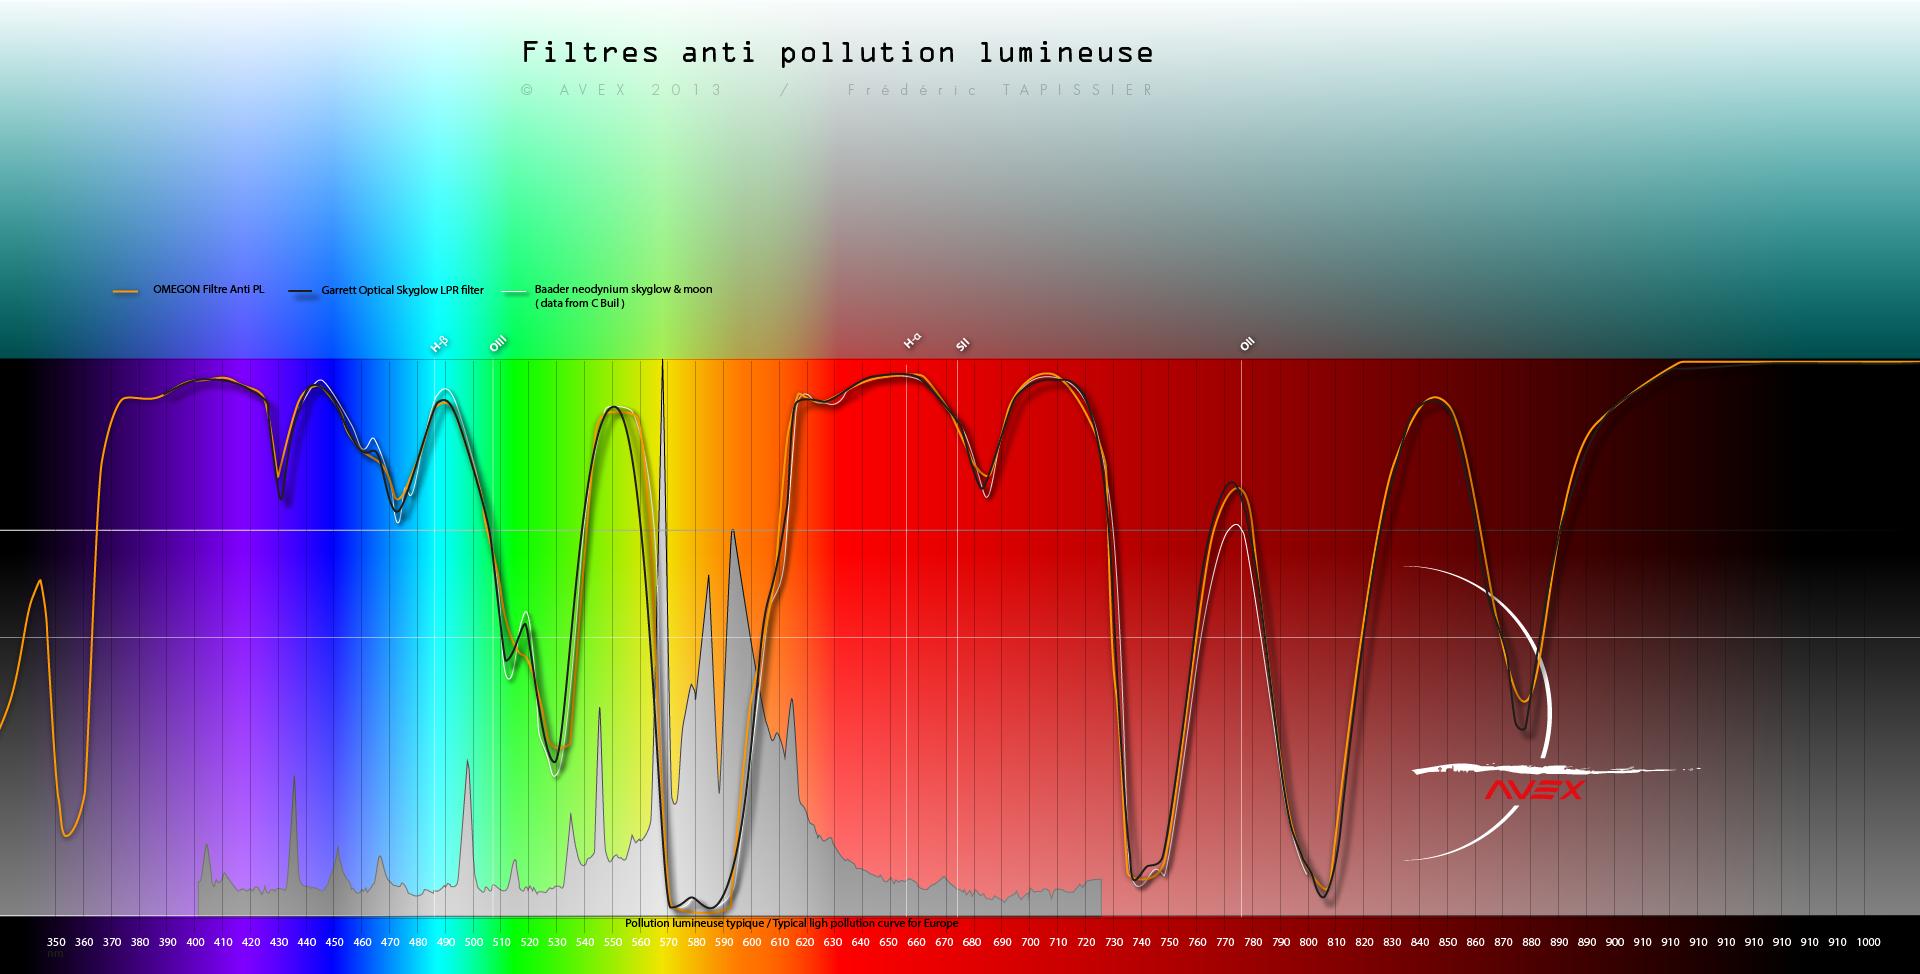 Filtre anti-pollution IDAS-LPS-D1 791731spectrefiltreavex5